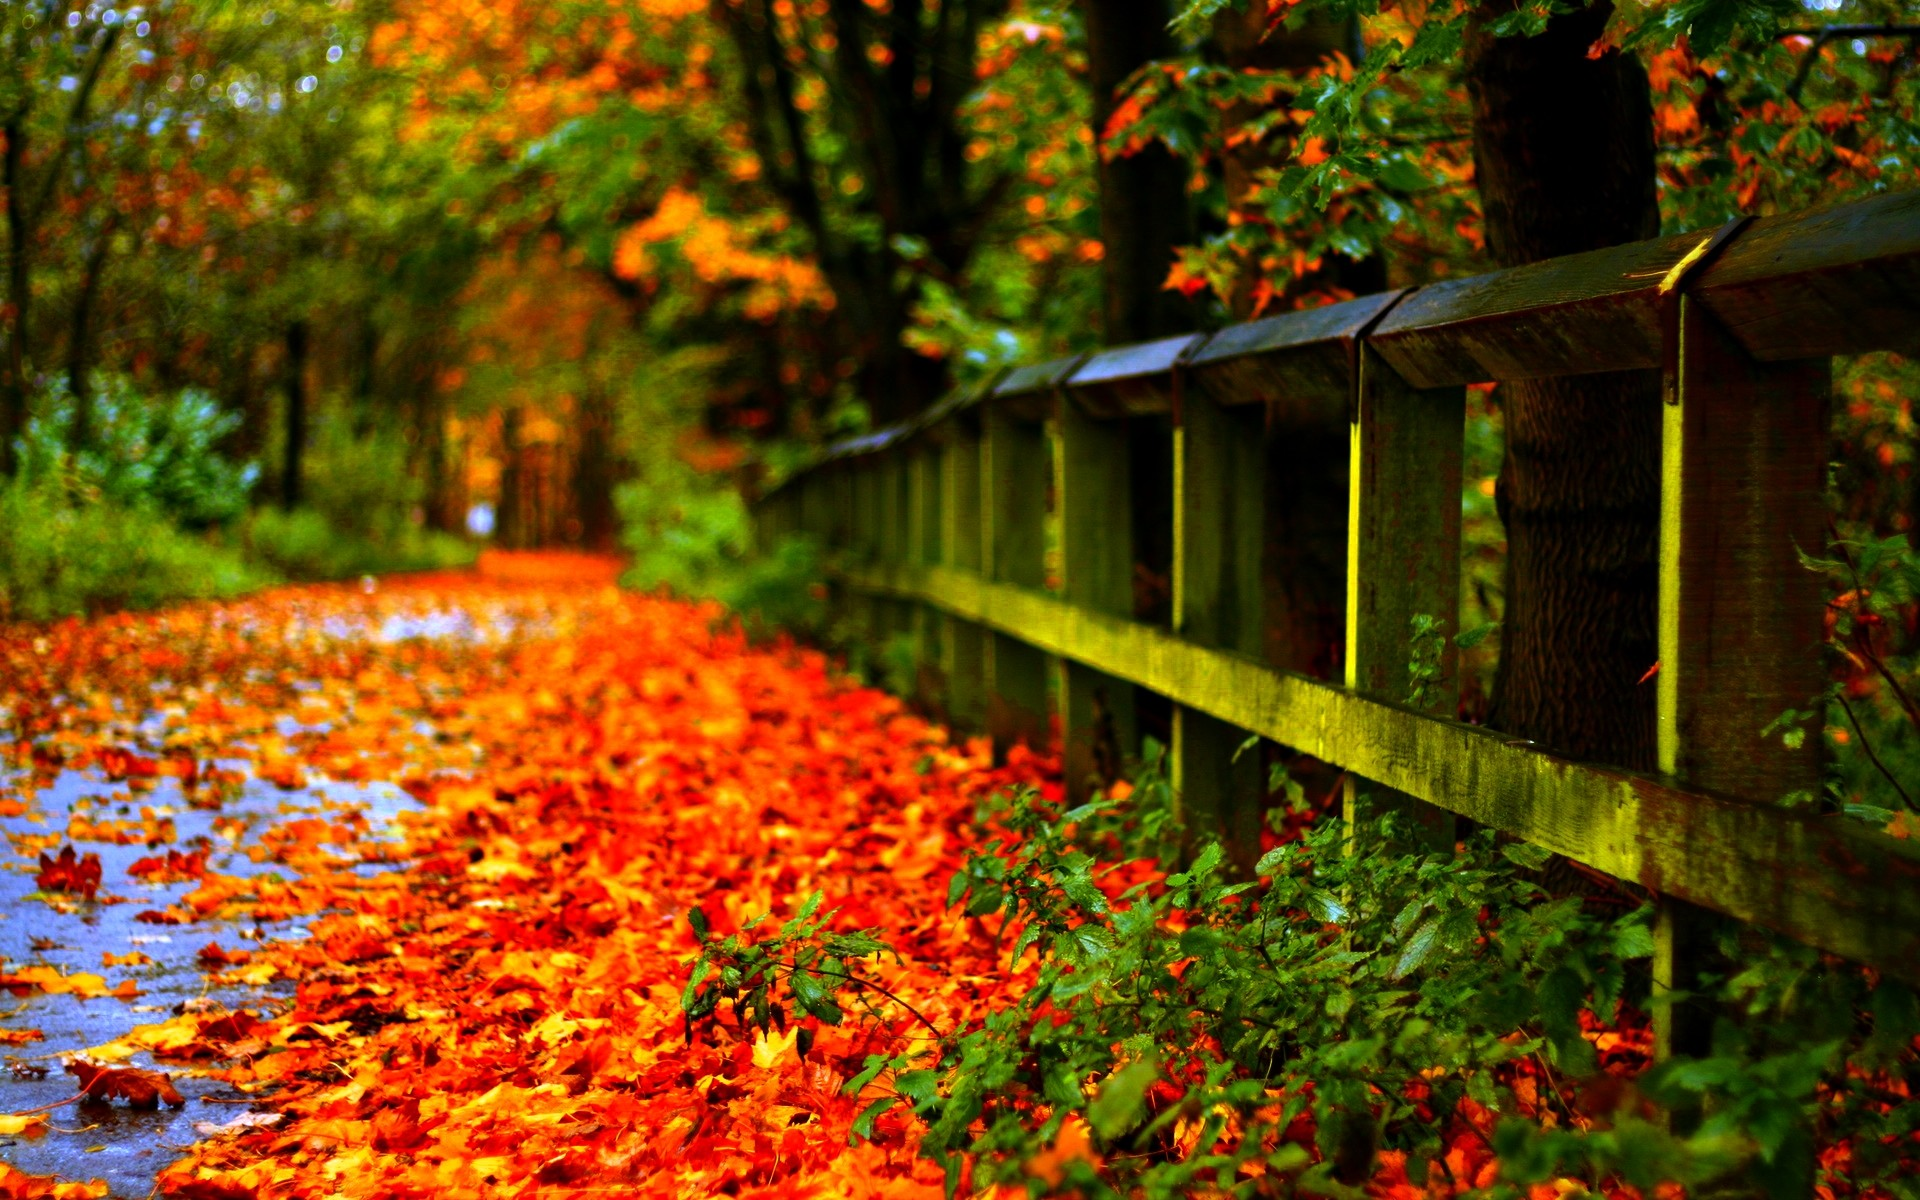 Hd Autumn Wallpaper 80 Images